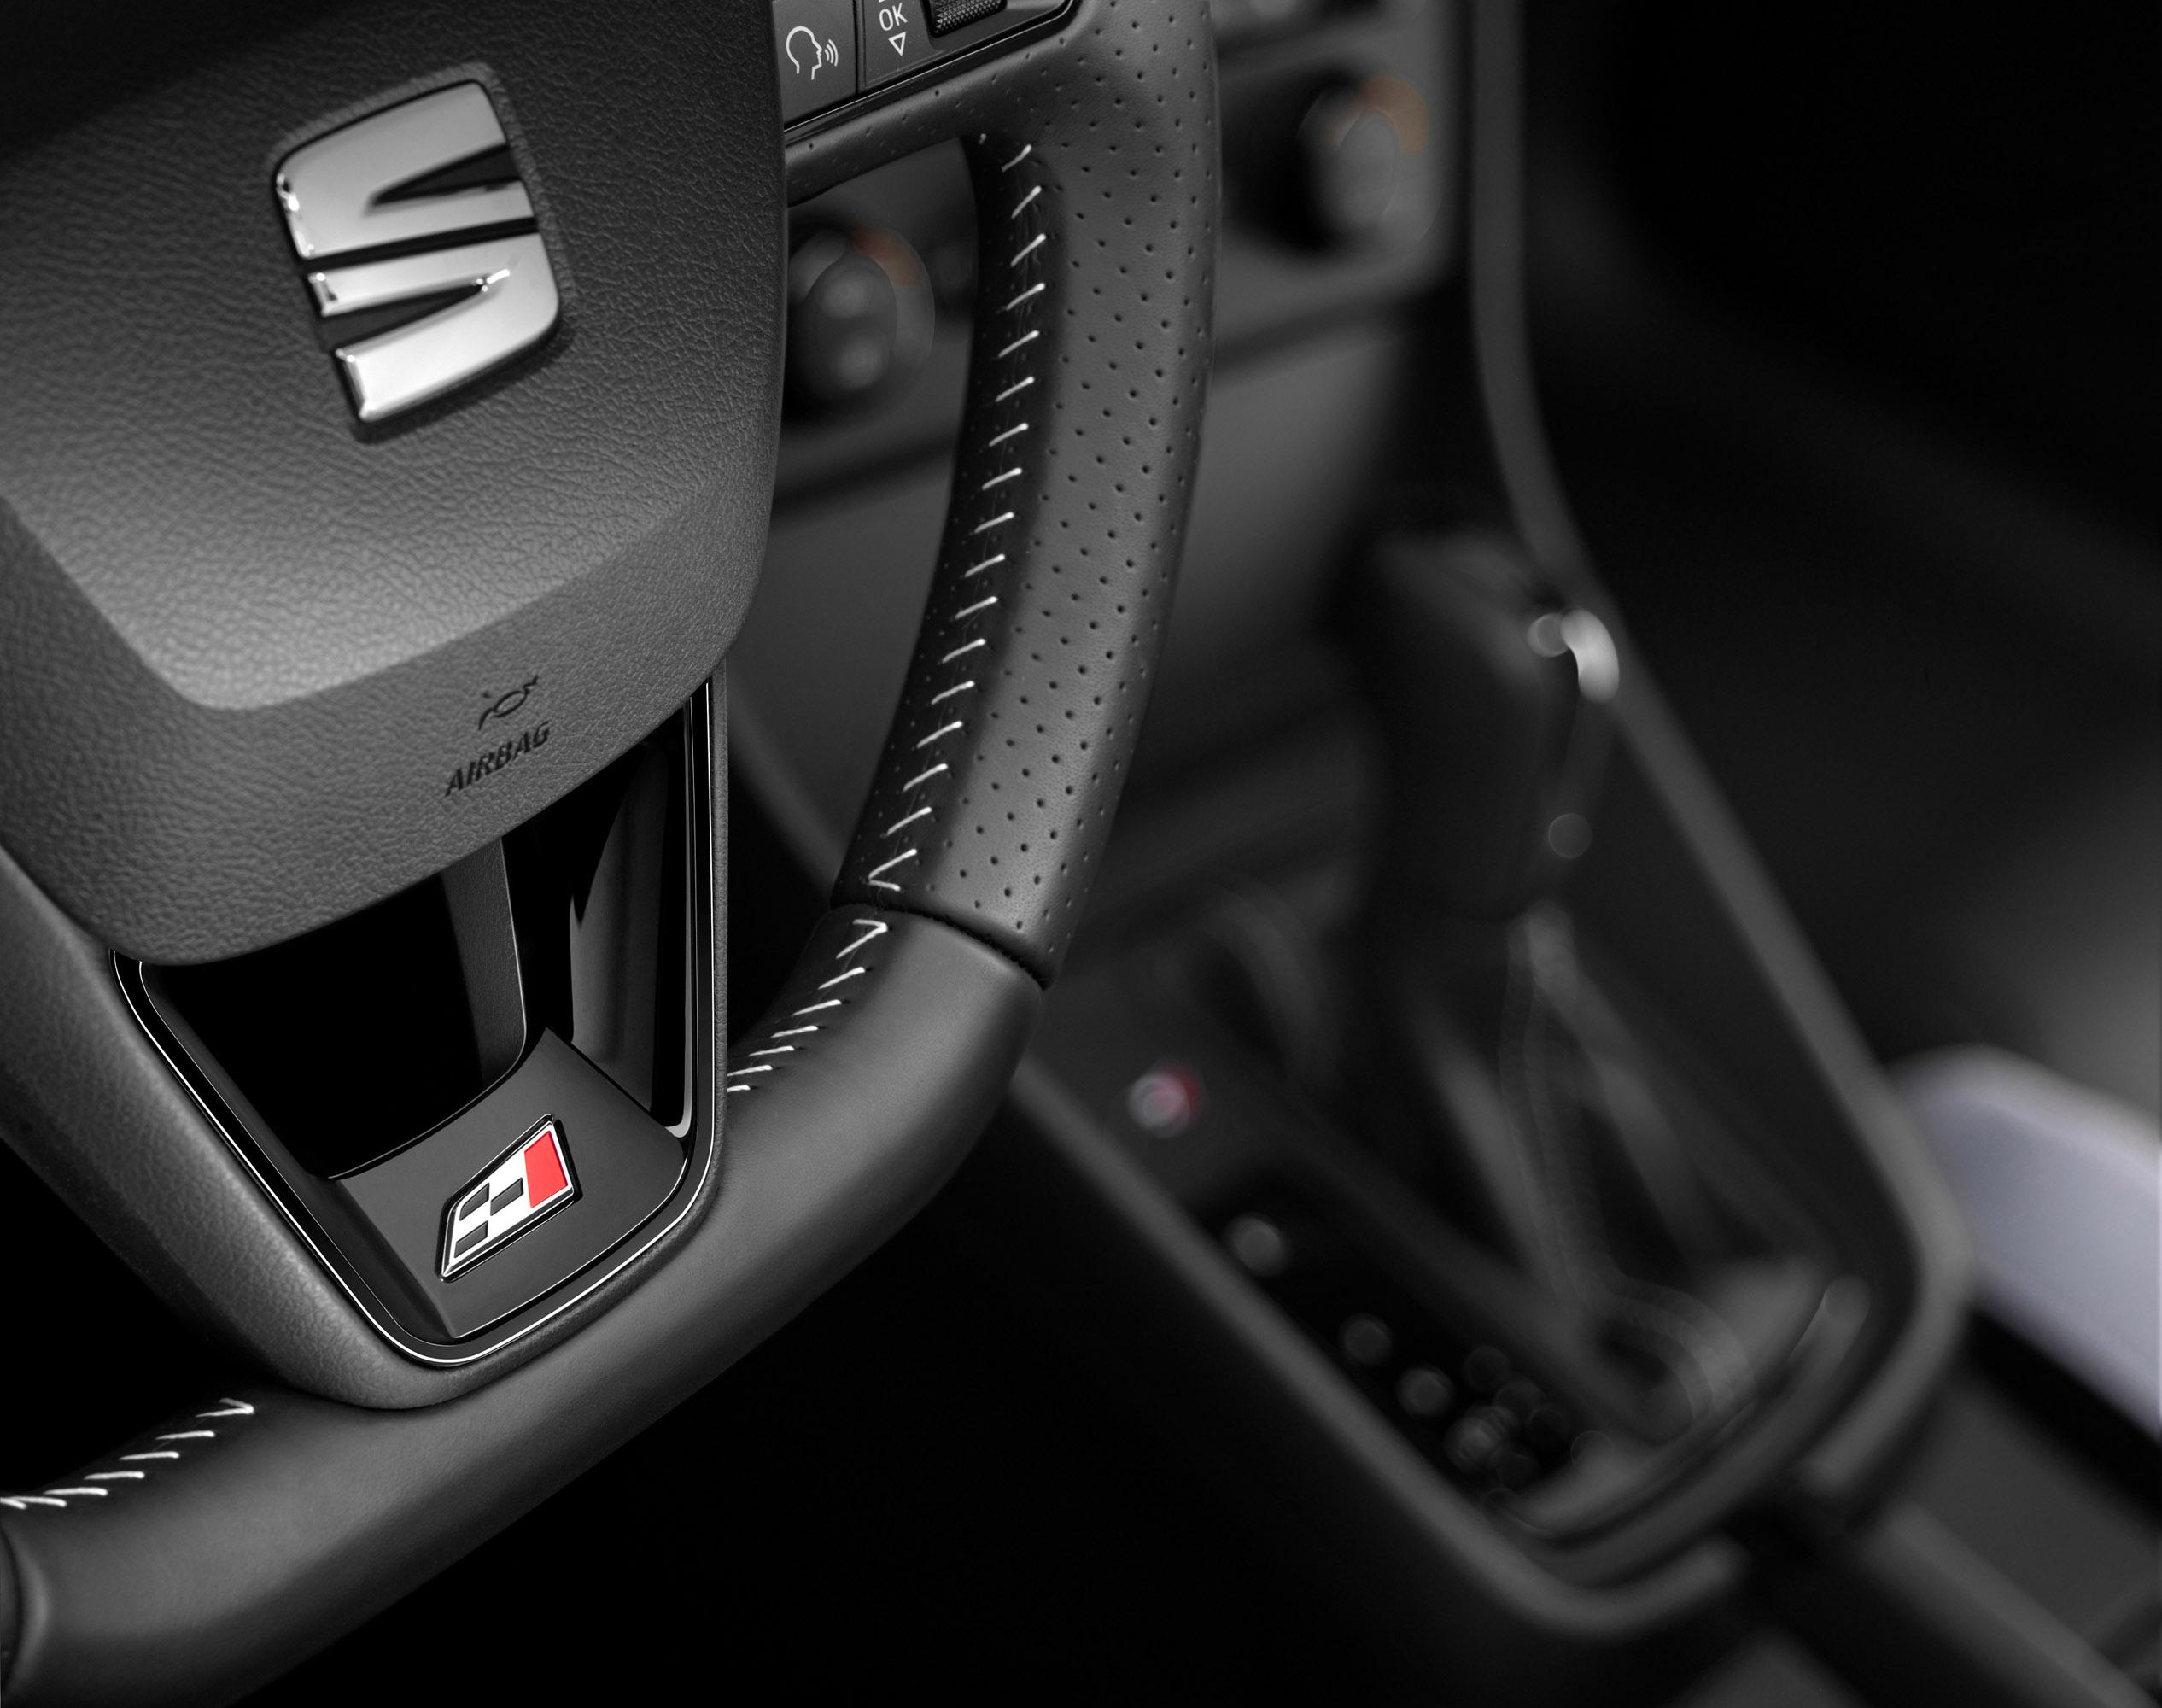 Seat Leon Cupra 280 Gets Sub8 Performance Pack